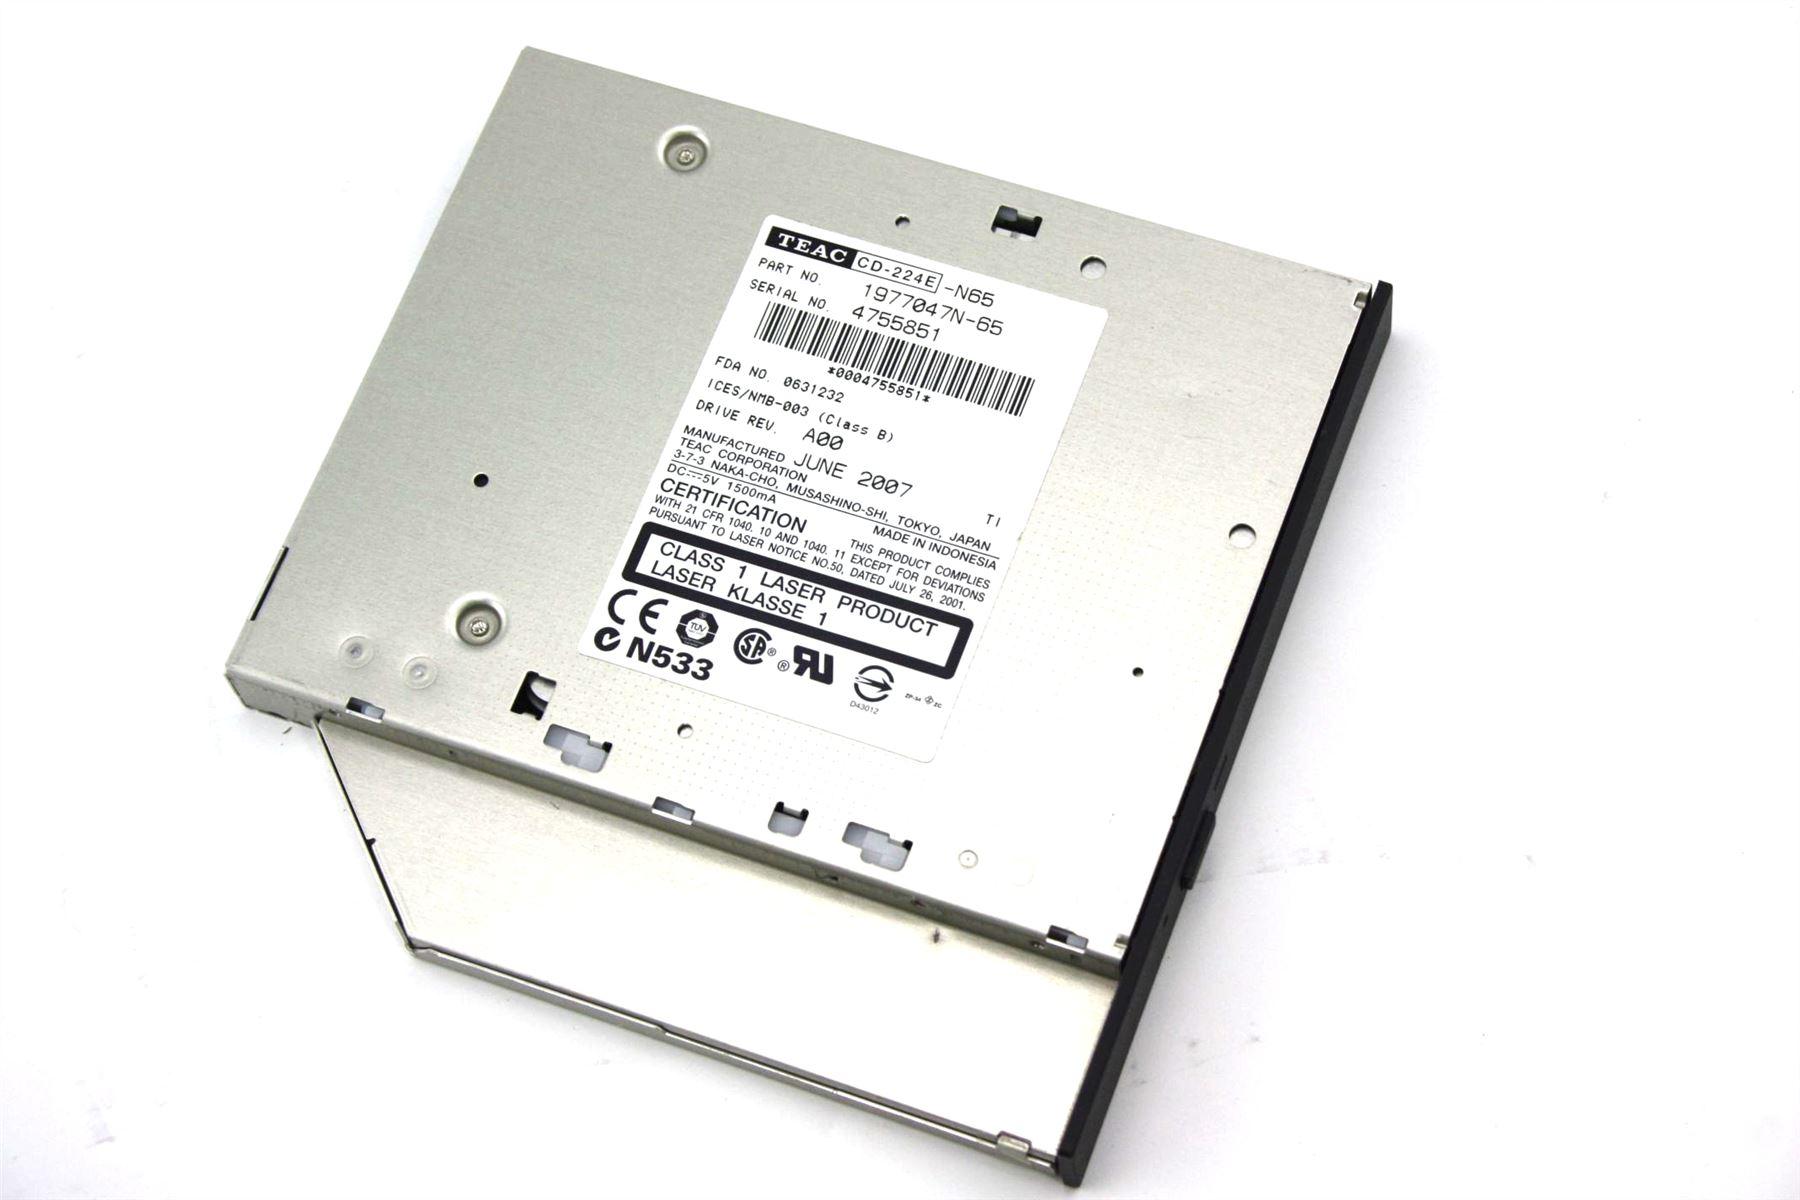 dell laptop has no cd drive